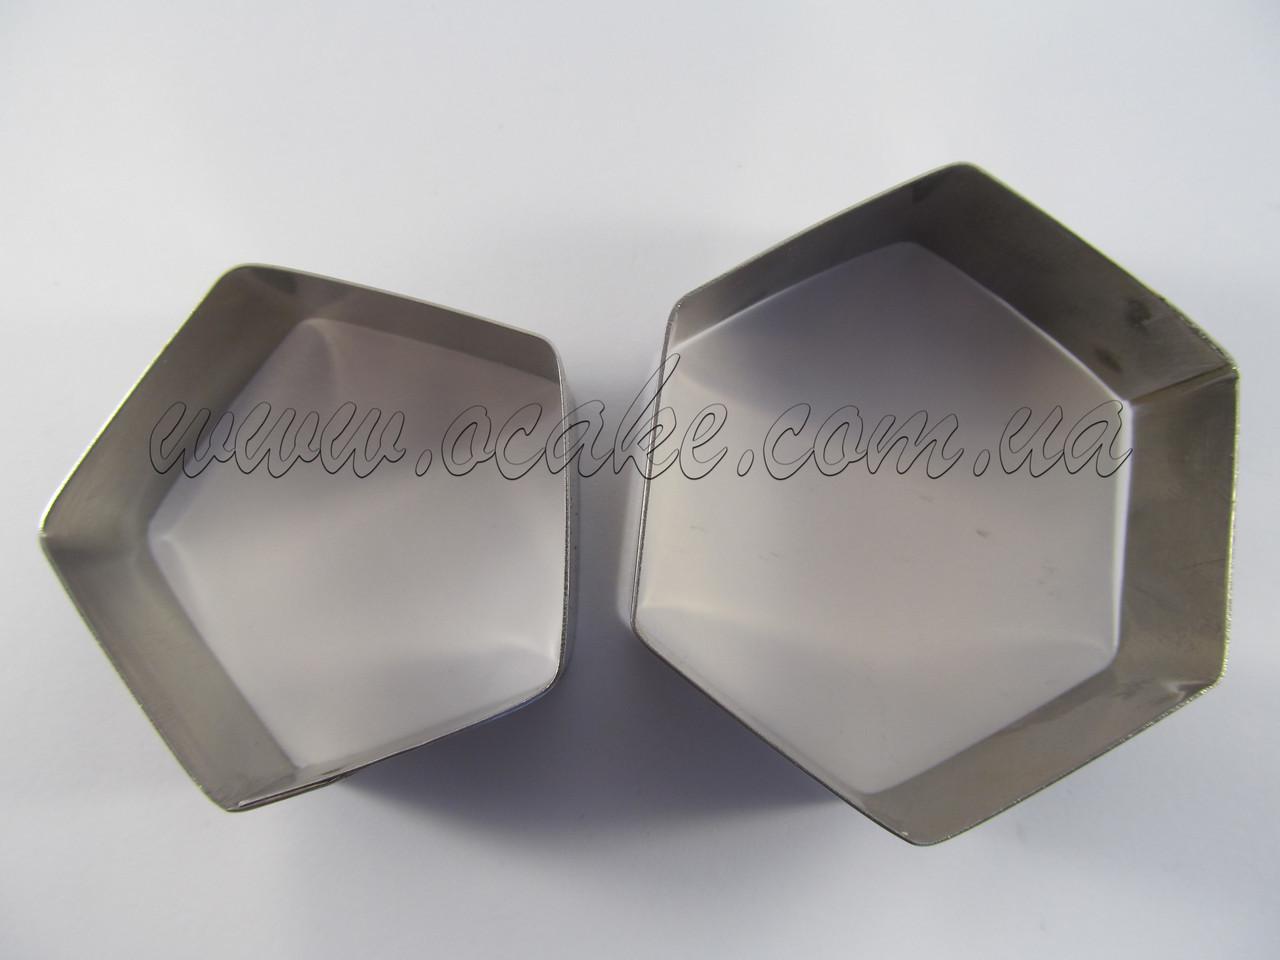 Каттер шестикутник і п'ятикутник для футбольного м'яча